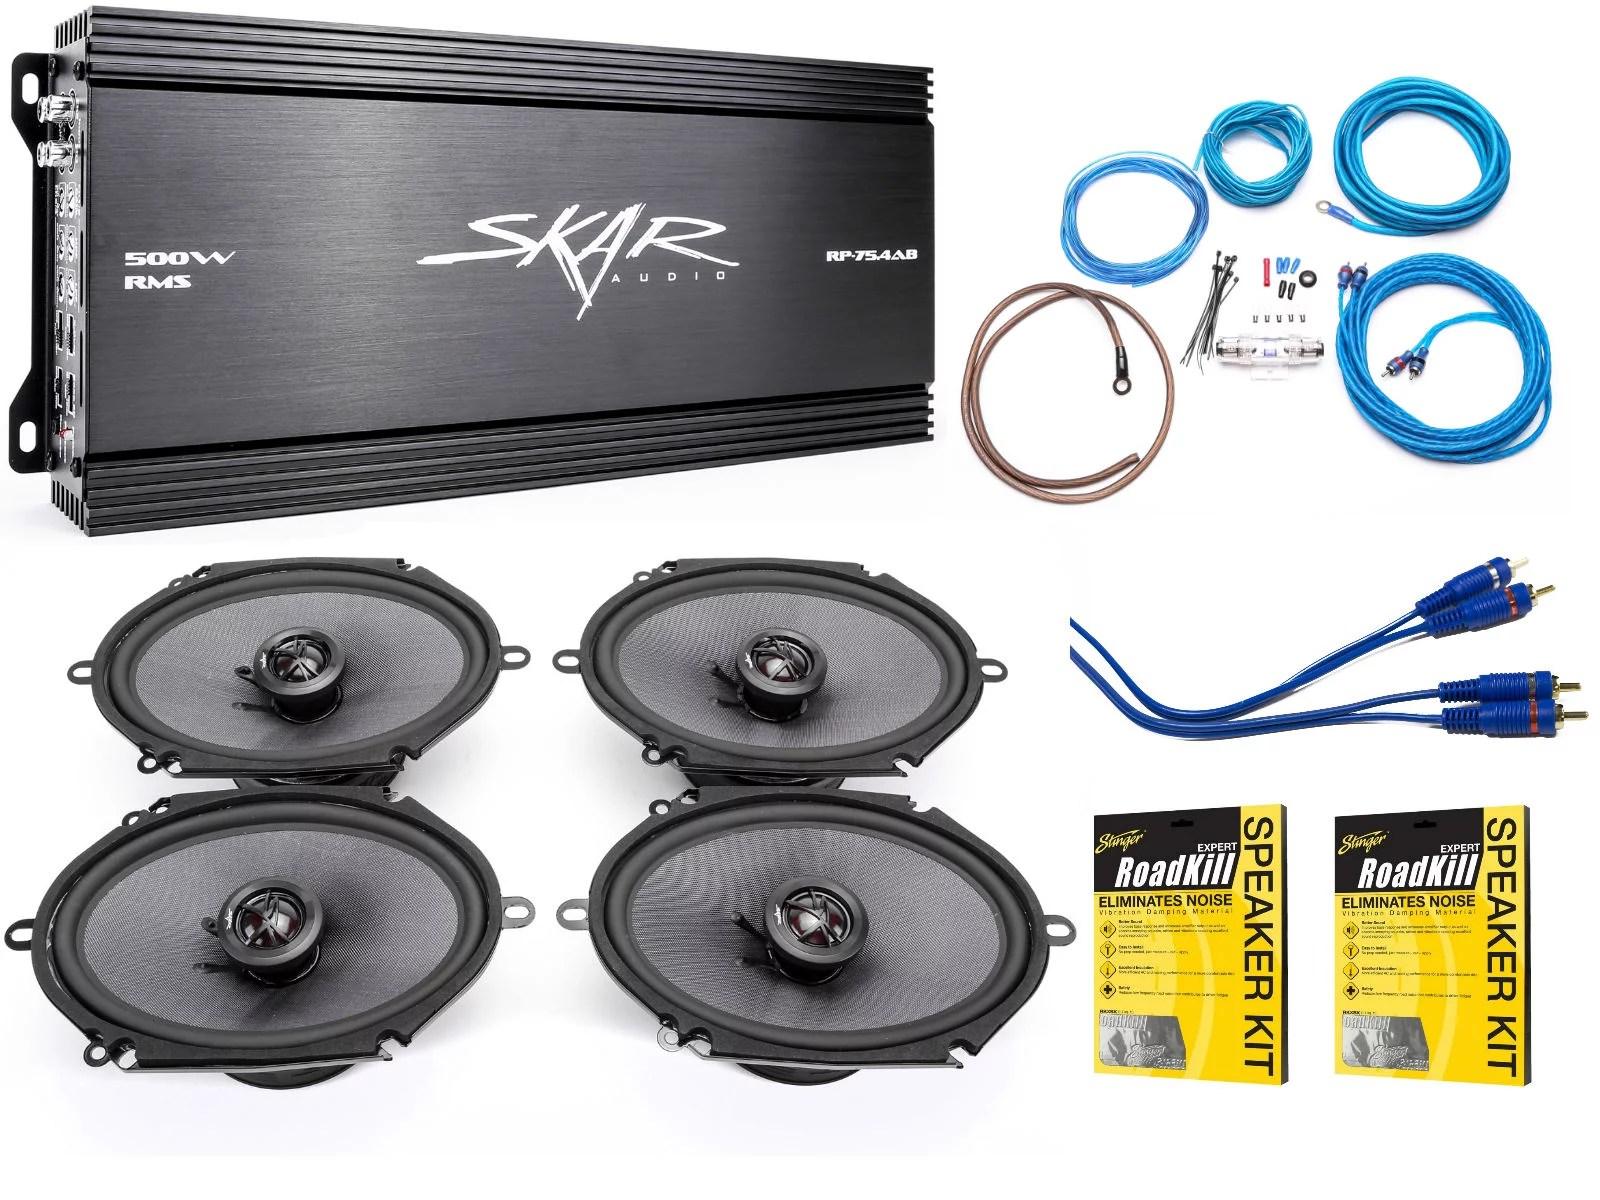 small resolution of skar audio 6 x8 complete elite speaker upgrade package with skar audio subwoofer wiring diagram skar audio wiring